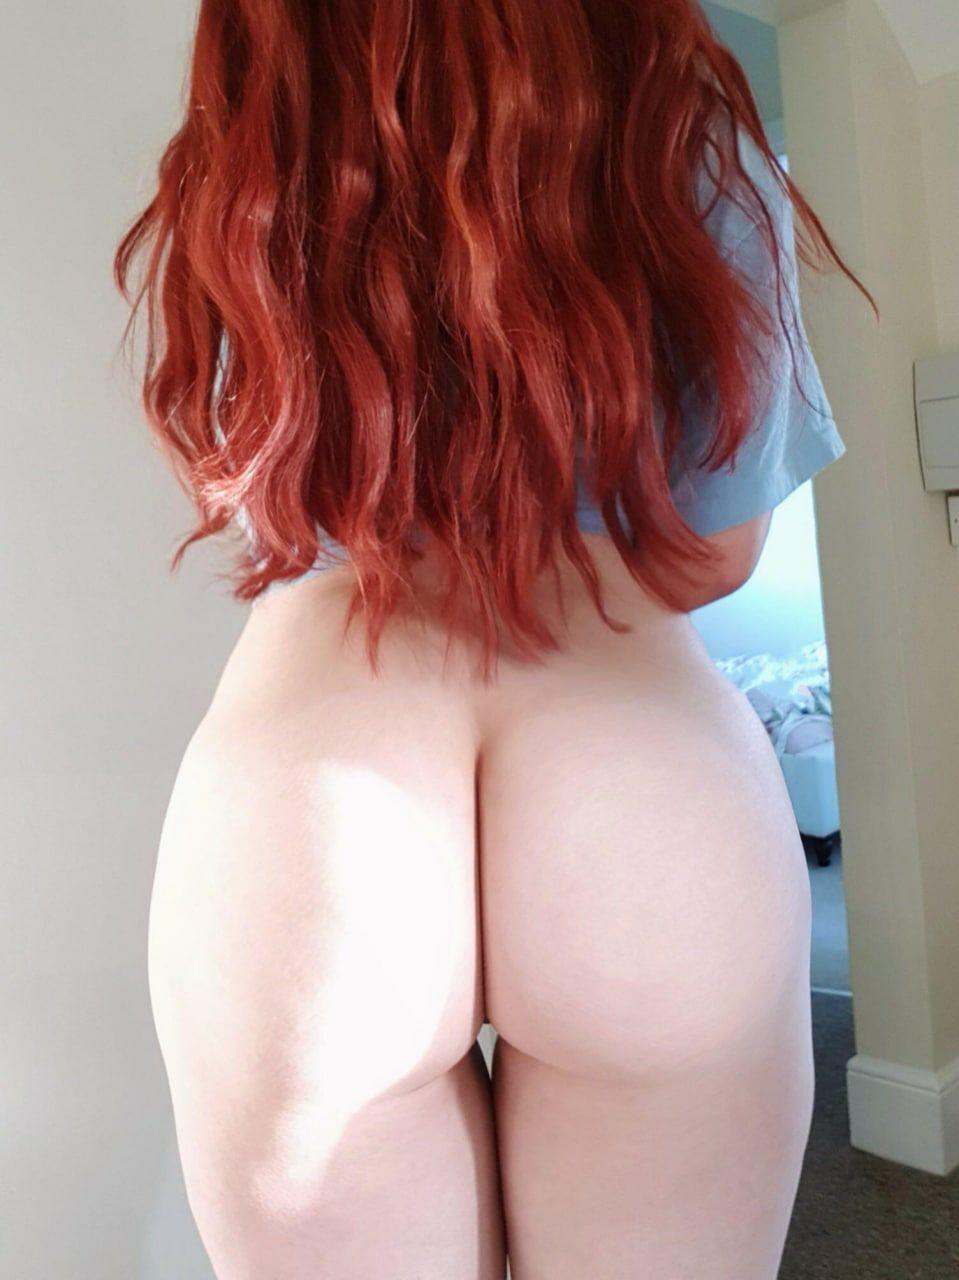 fotos Super tetonas sexo chicas tetas grandes pechos gigantes